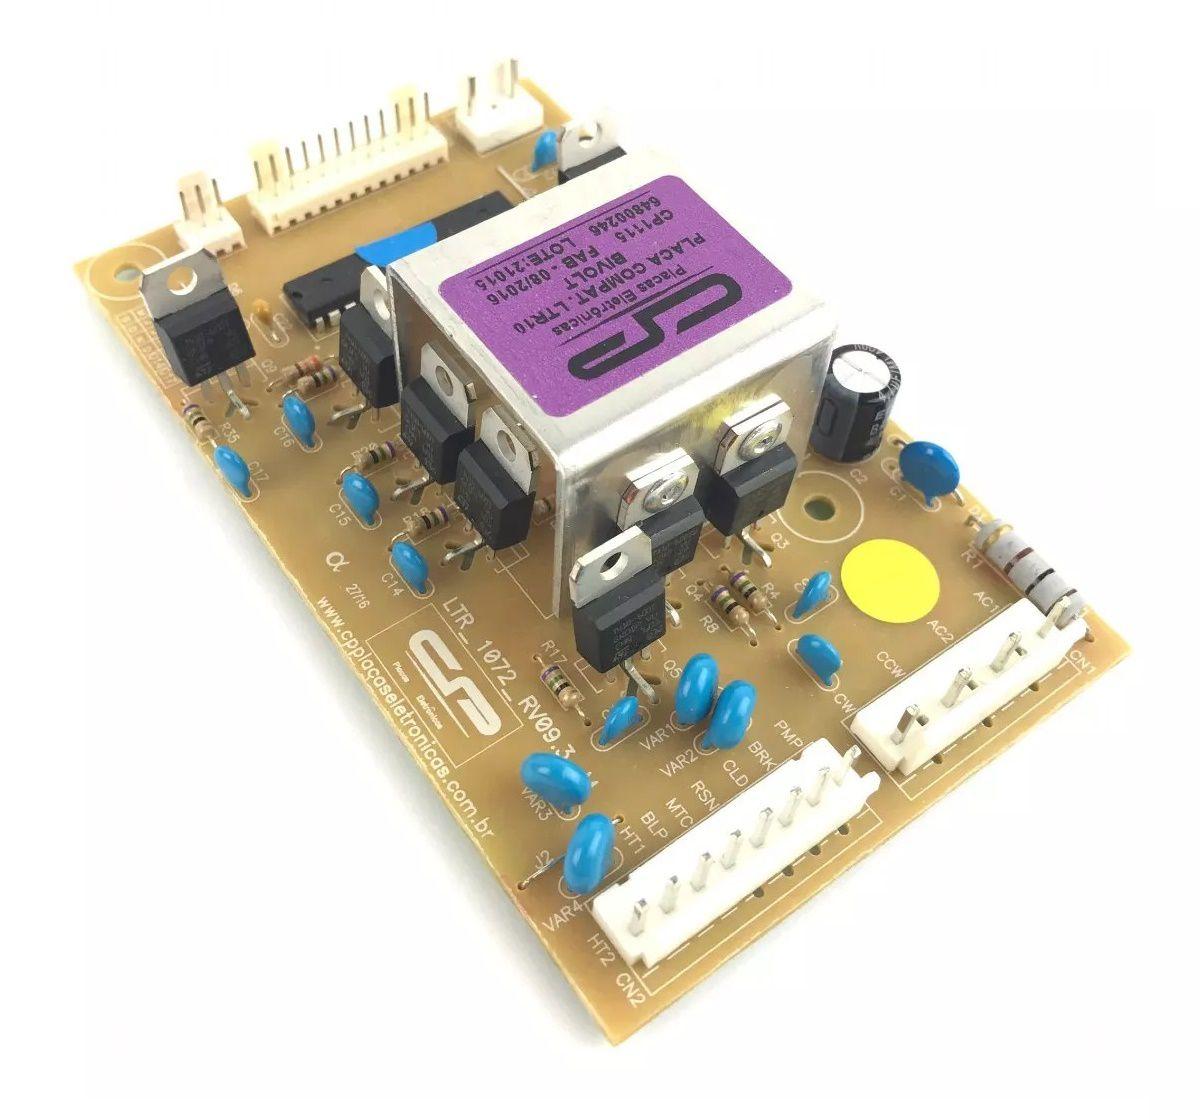 Placa Lavadora Electrolux Ltr10 Compatível cód:64800246